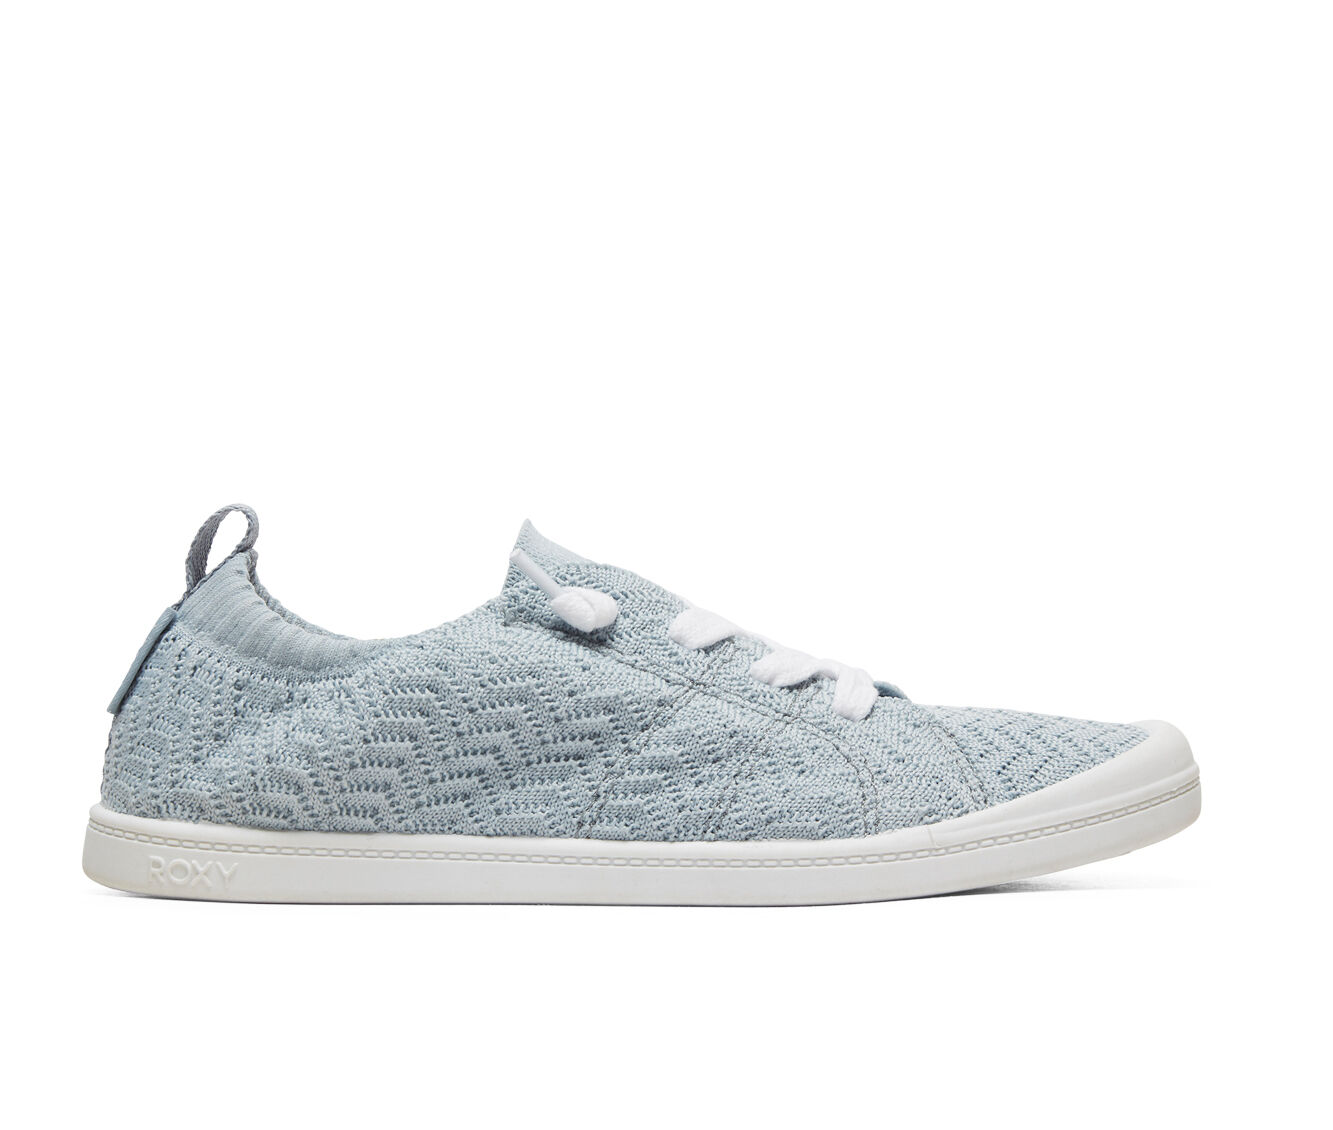 Women's Roxy Bayshore Sneakers Baja Blue